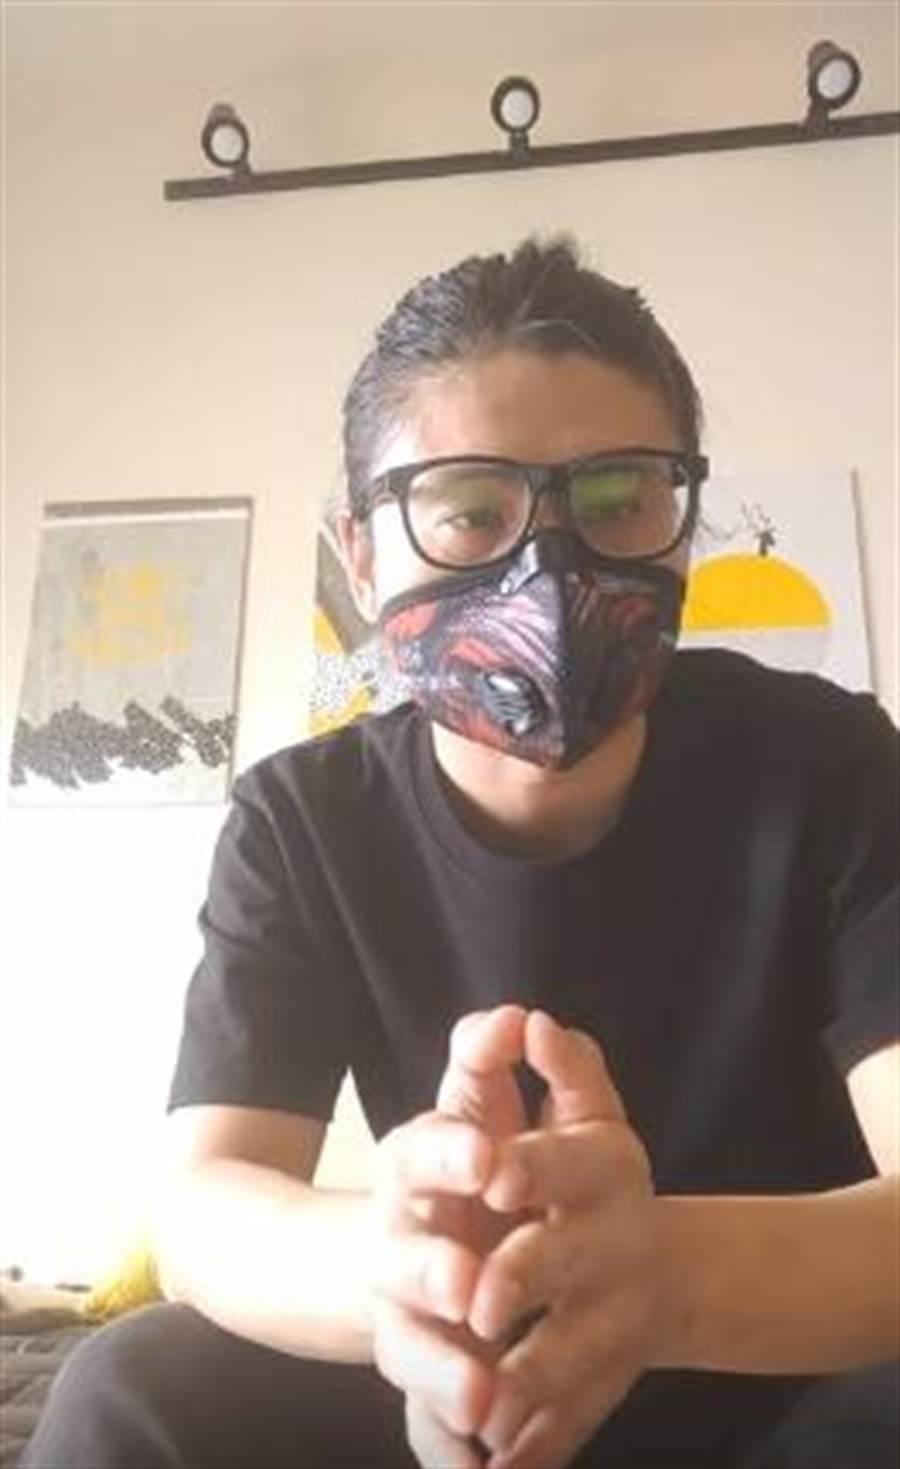 YouTuber教授鼠鼠透過影片自白自己渣男惡行。(翻攝自youtube頻道《教授鼠鼠》)